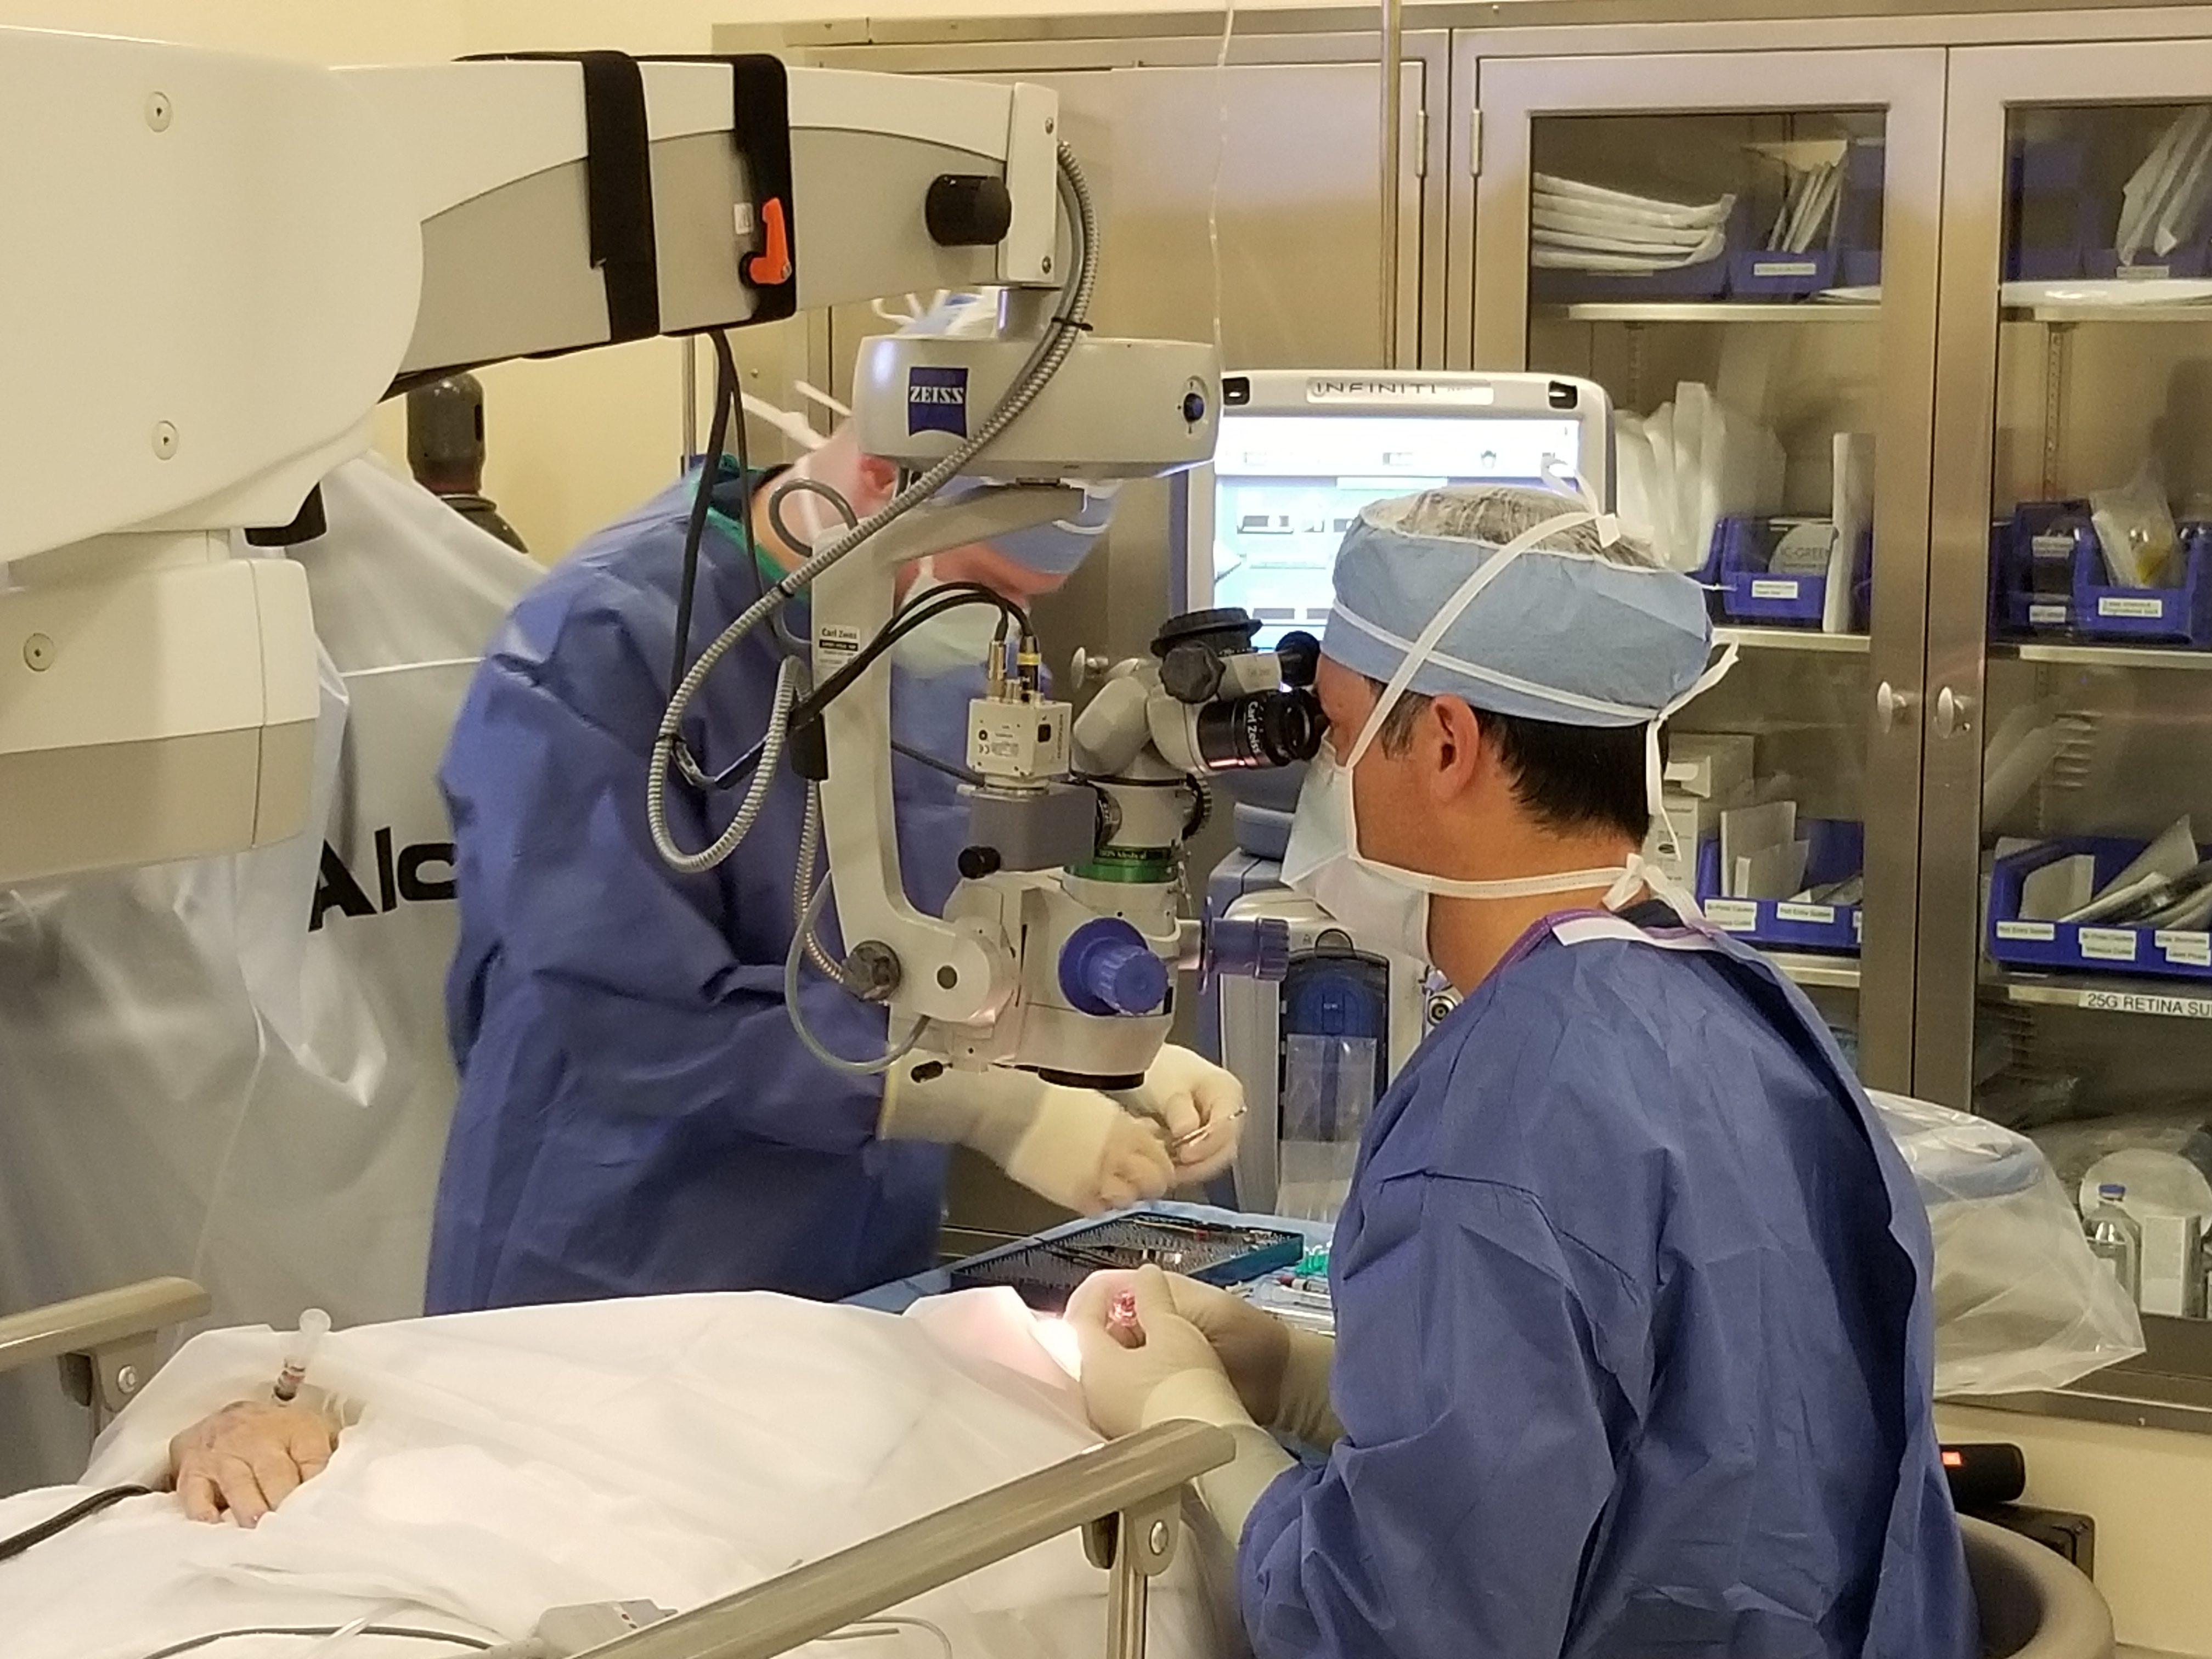 Why Go Dropless Cataract Surgery Eliminates Postoperative Eyedrops